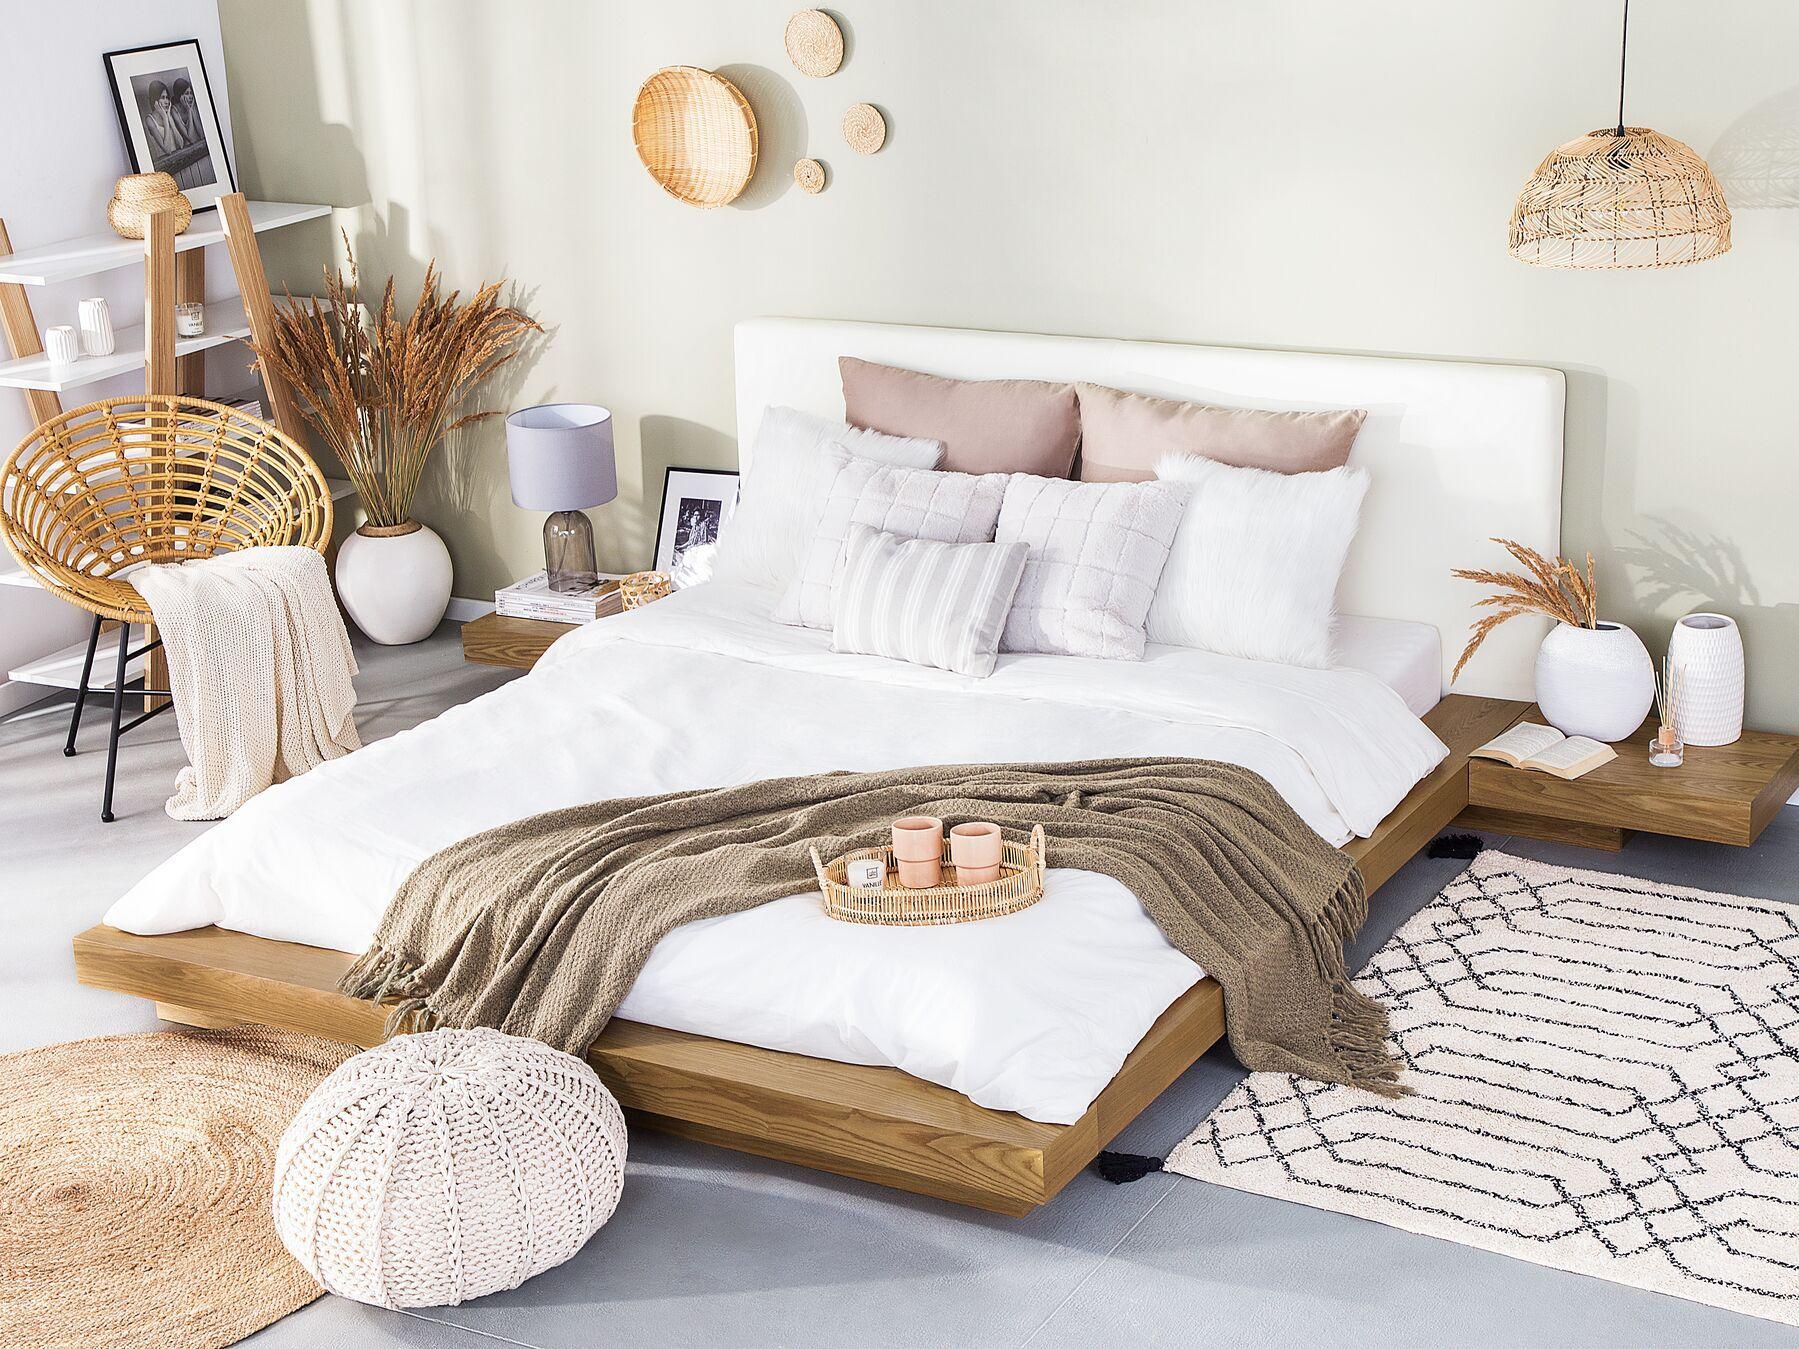 Eu Super King Size Waterbed Light Wood Zen Japanese Futon Bed